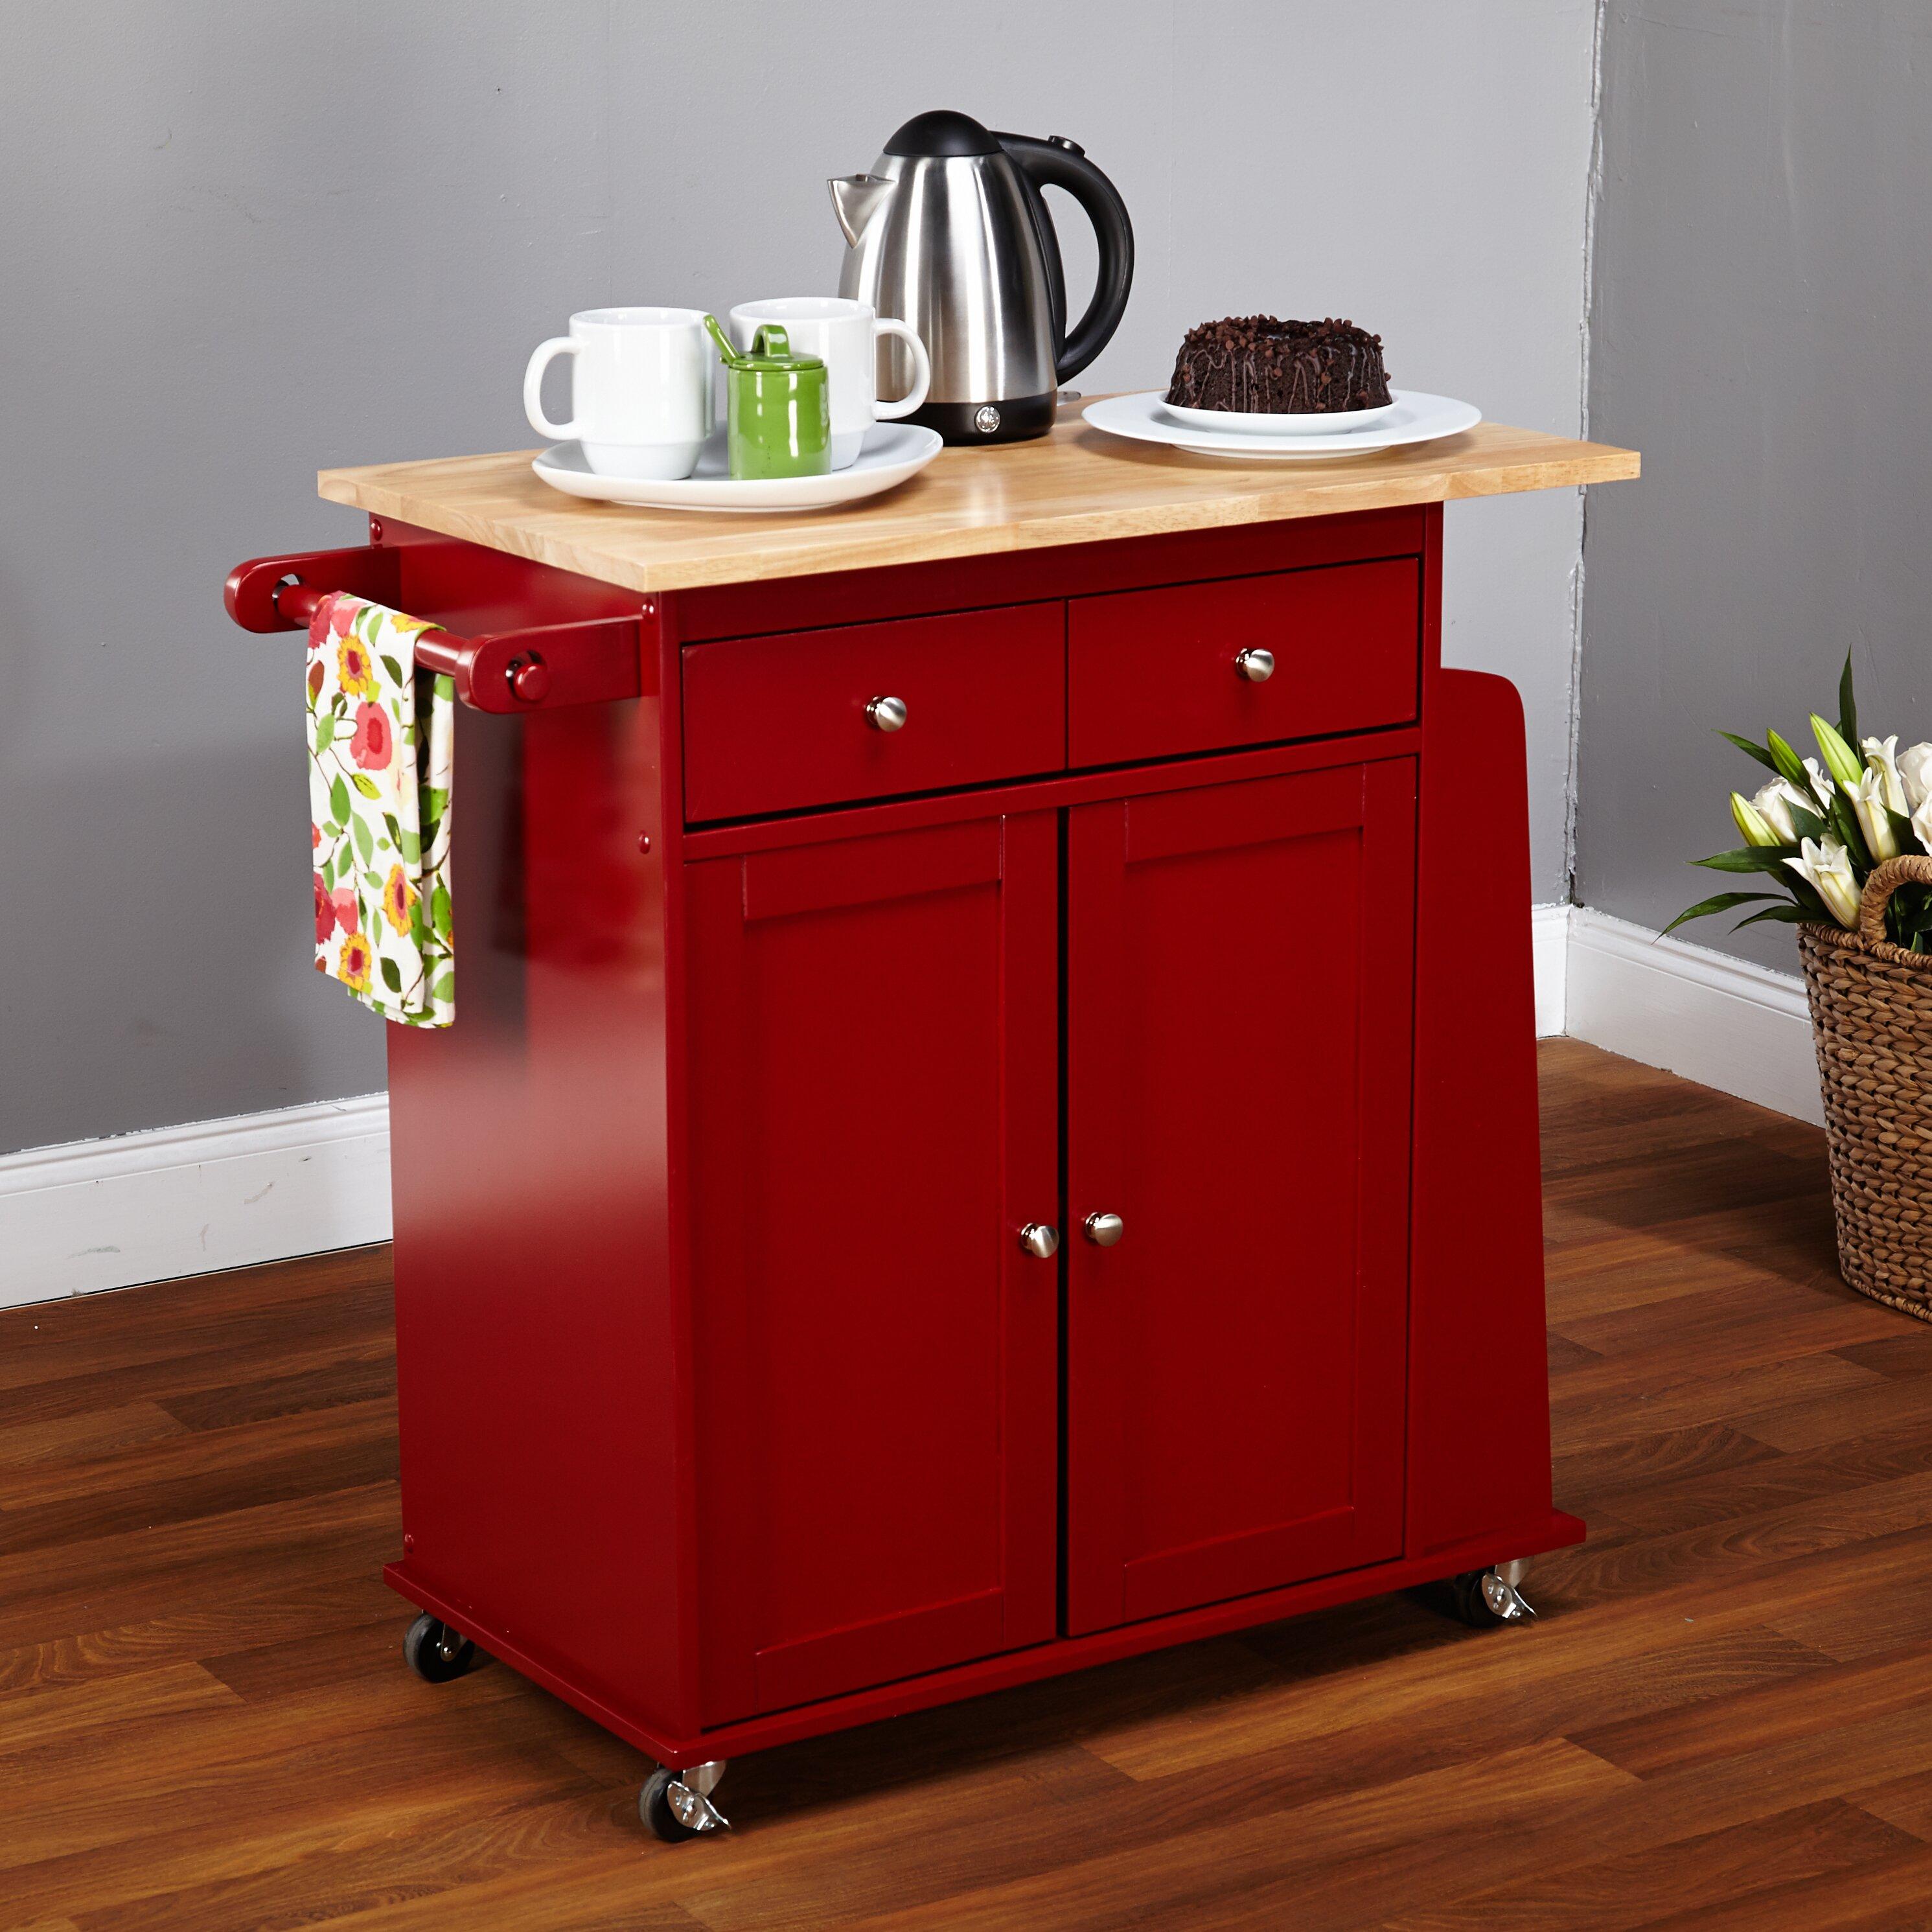 Kitchen Work Table On Wheels Kitchen Islands Carts Youll Love Wayfair